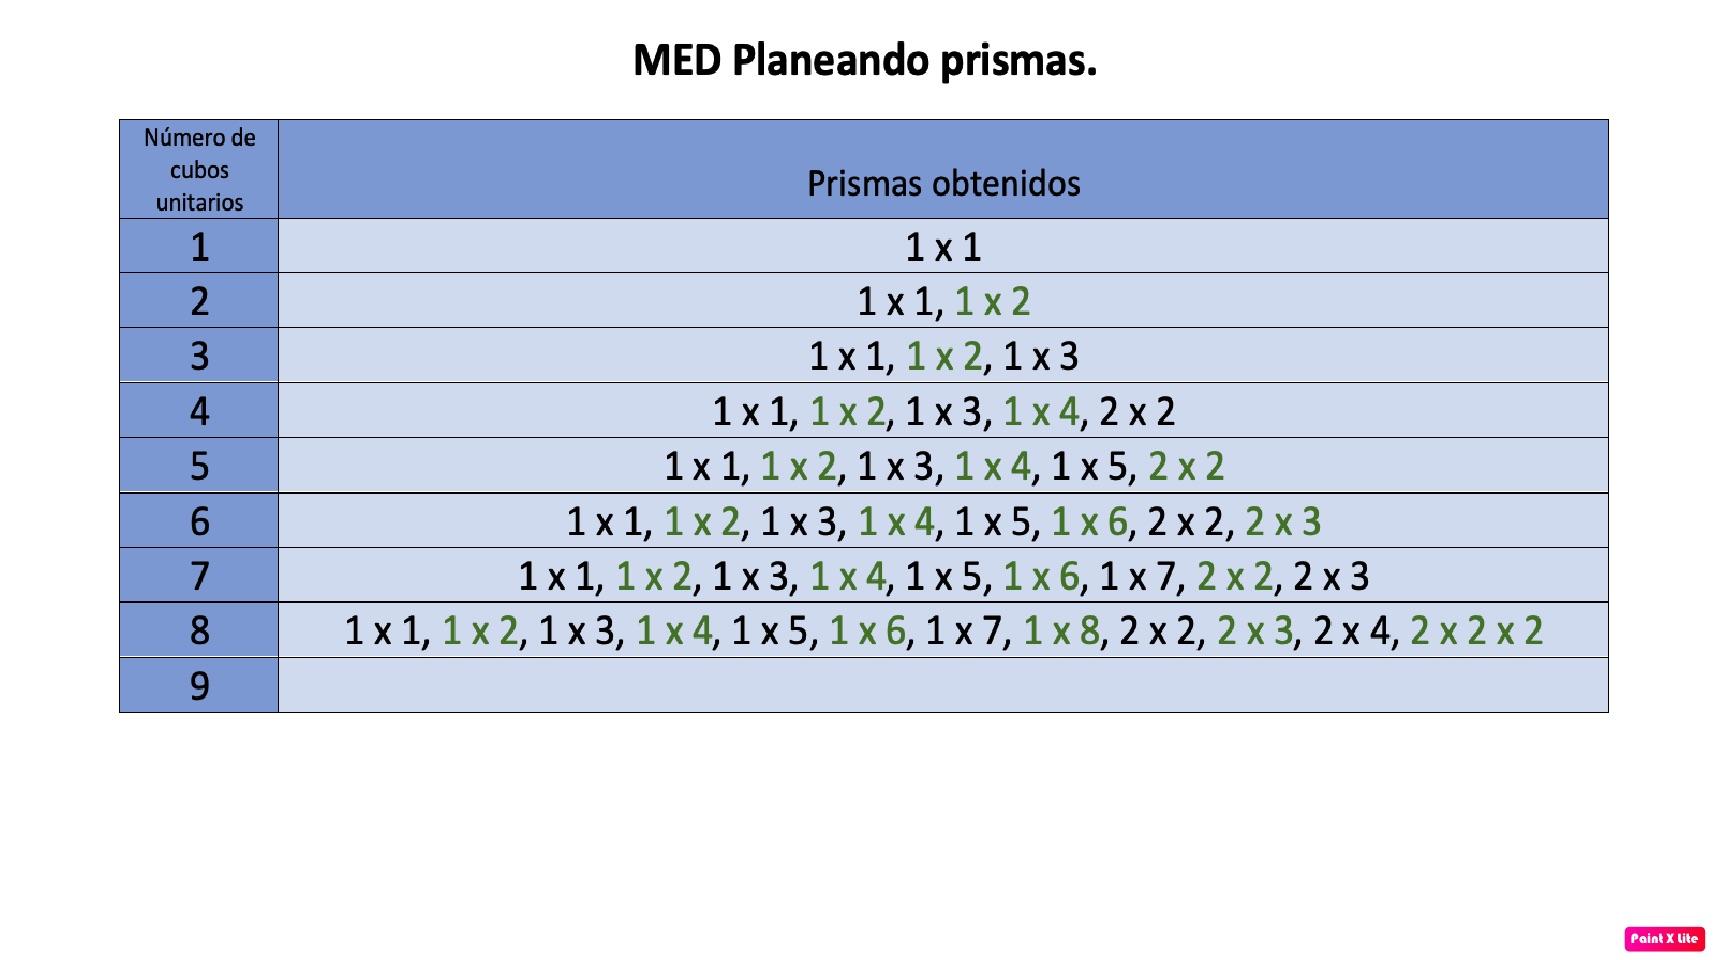 Planeando+prismas.jpg